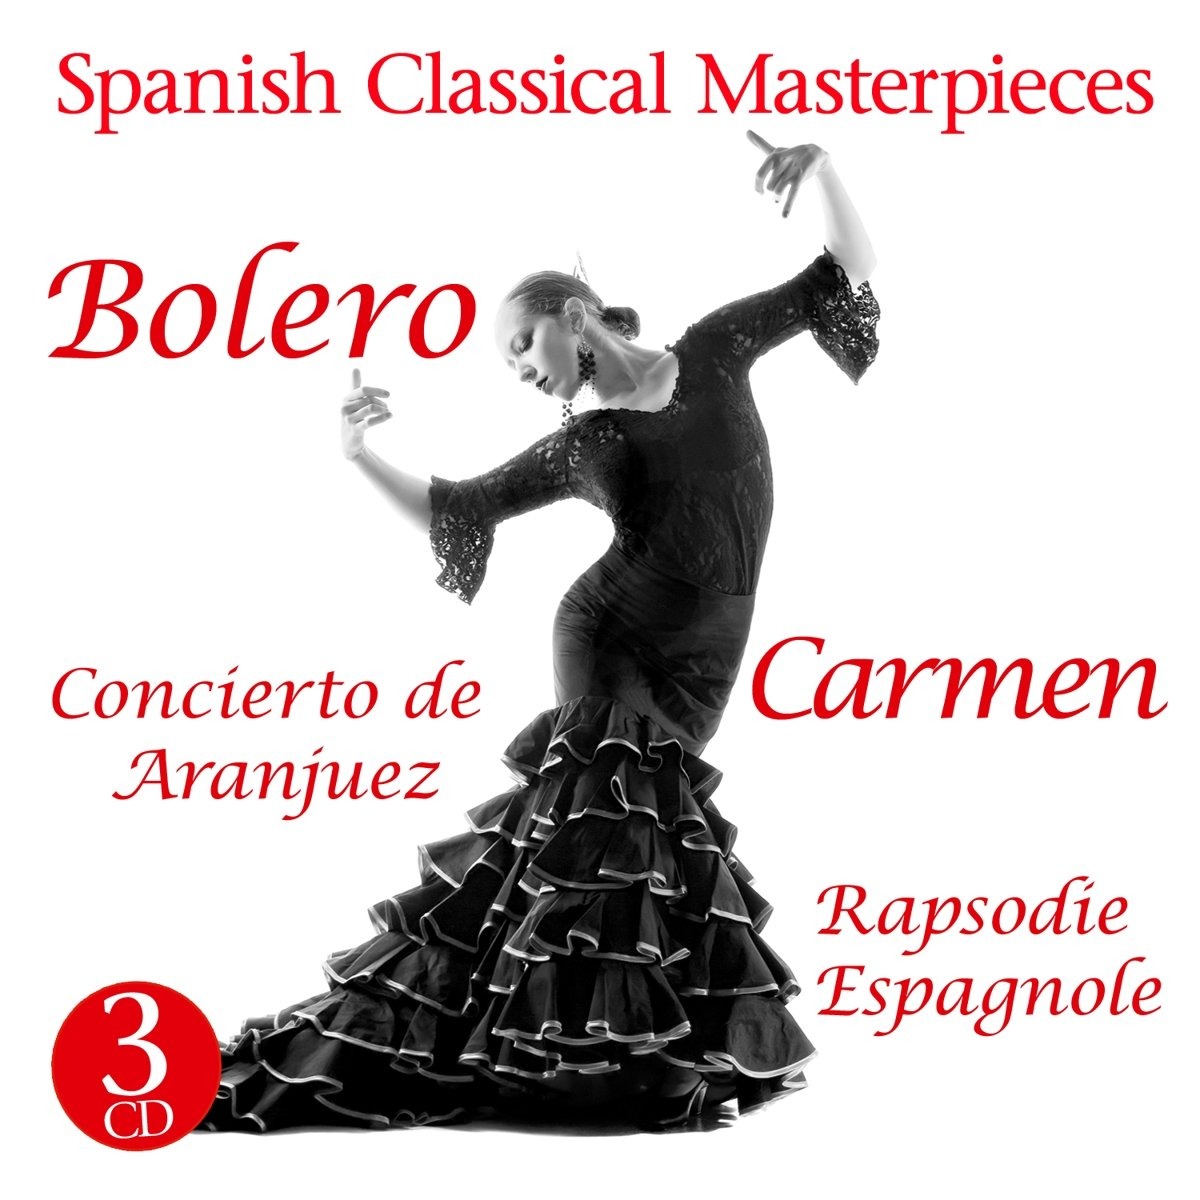 Фото - Various Artists Various Artists. Carmen, Bolero, Concierto De Aranjuez (3 CD) narciso yepes joaquin rodrigo concierto de aranjuez fantasia